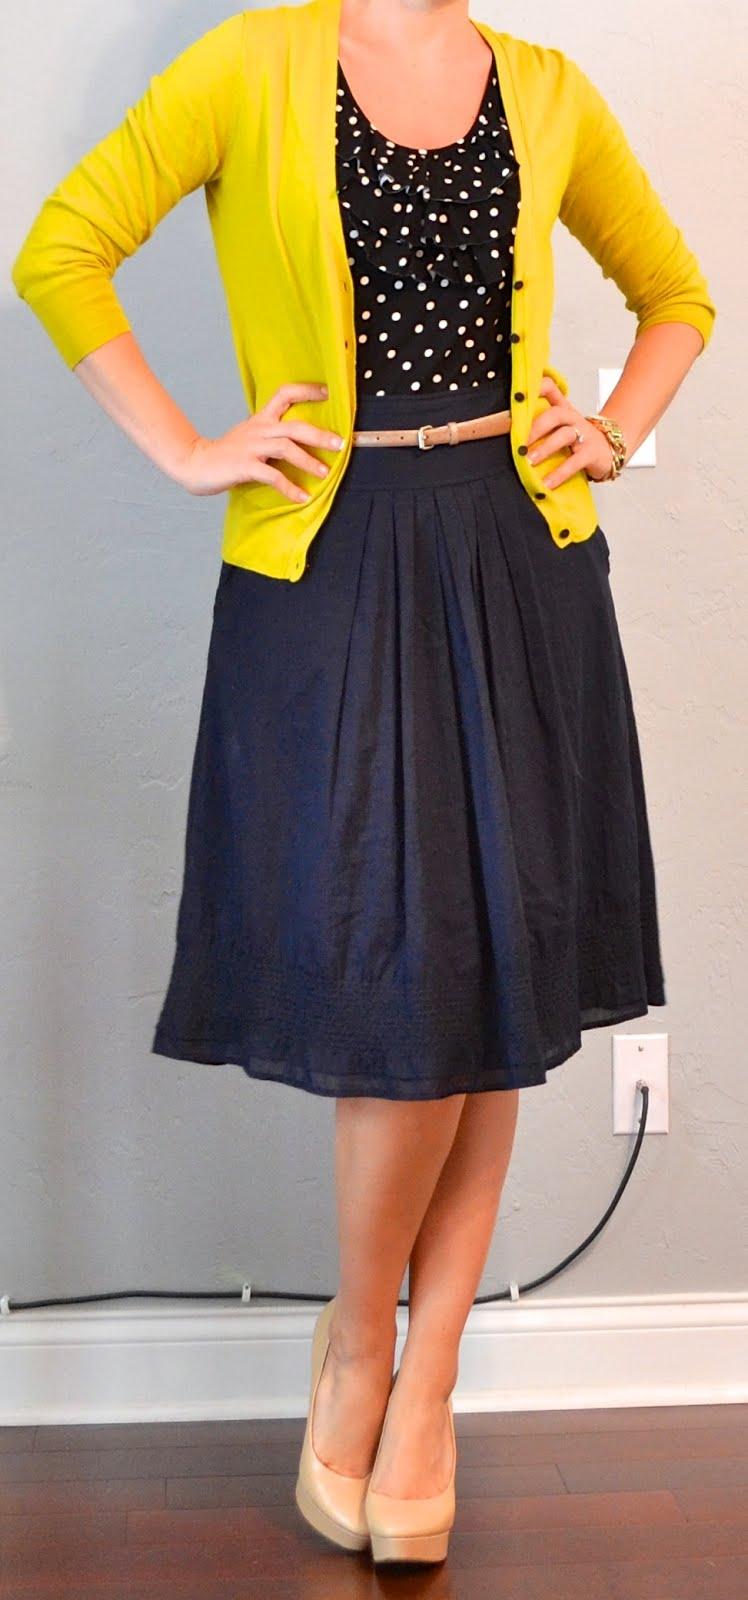 Cardigan And Skirt 81